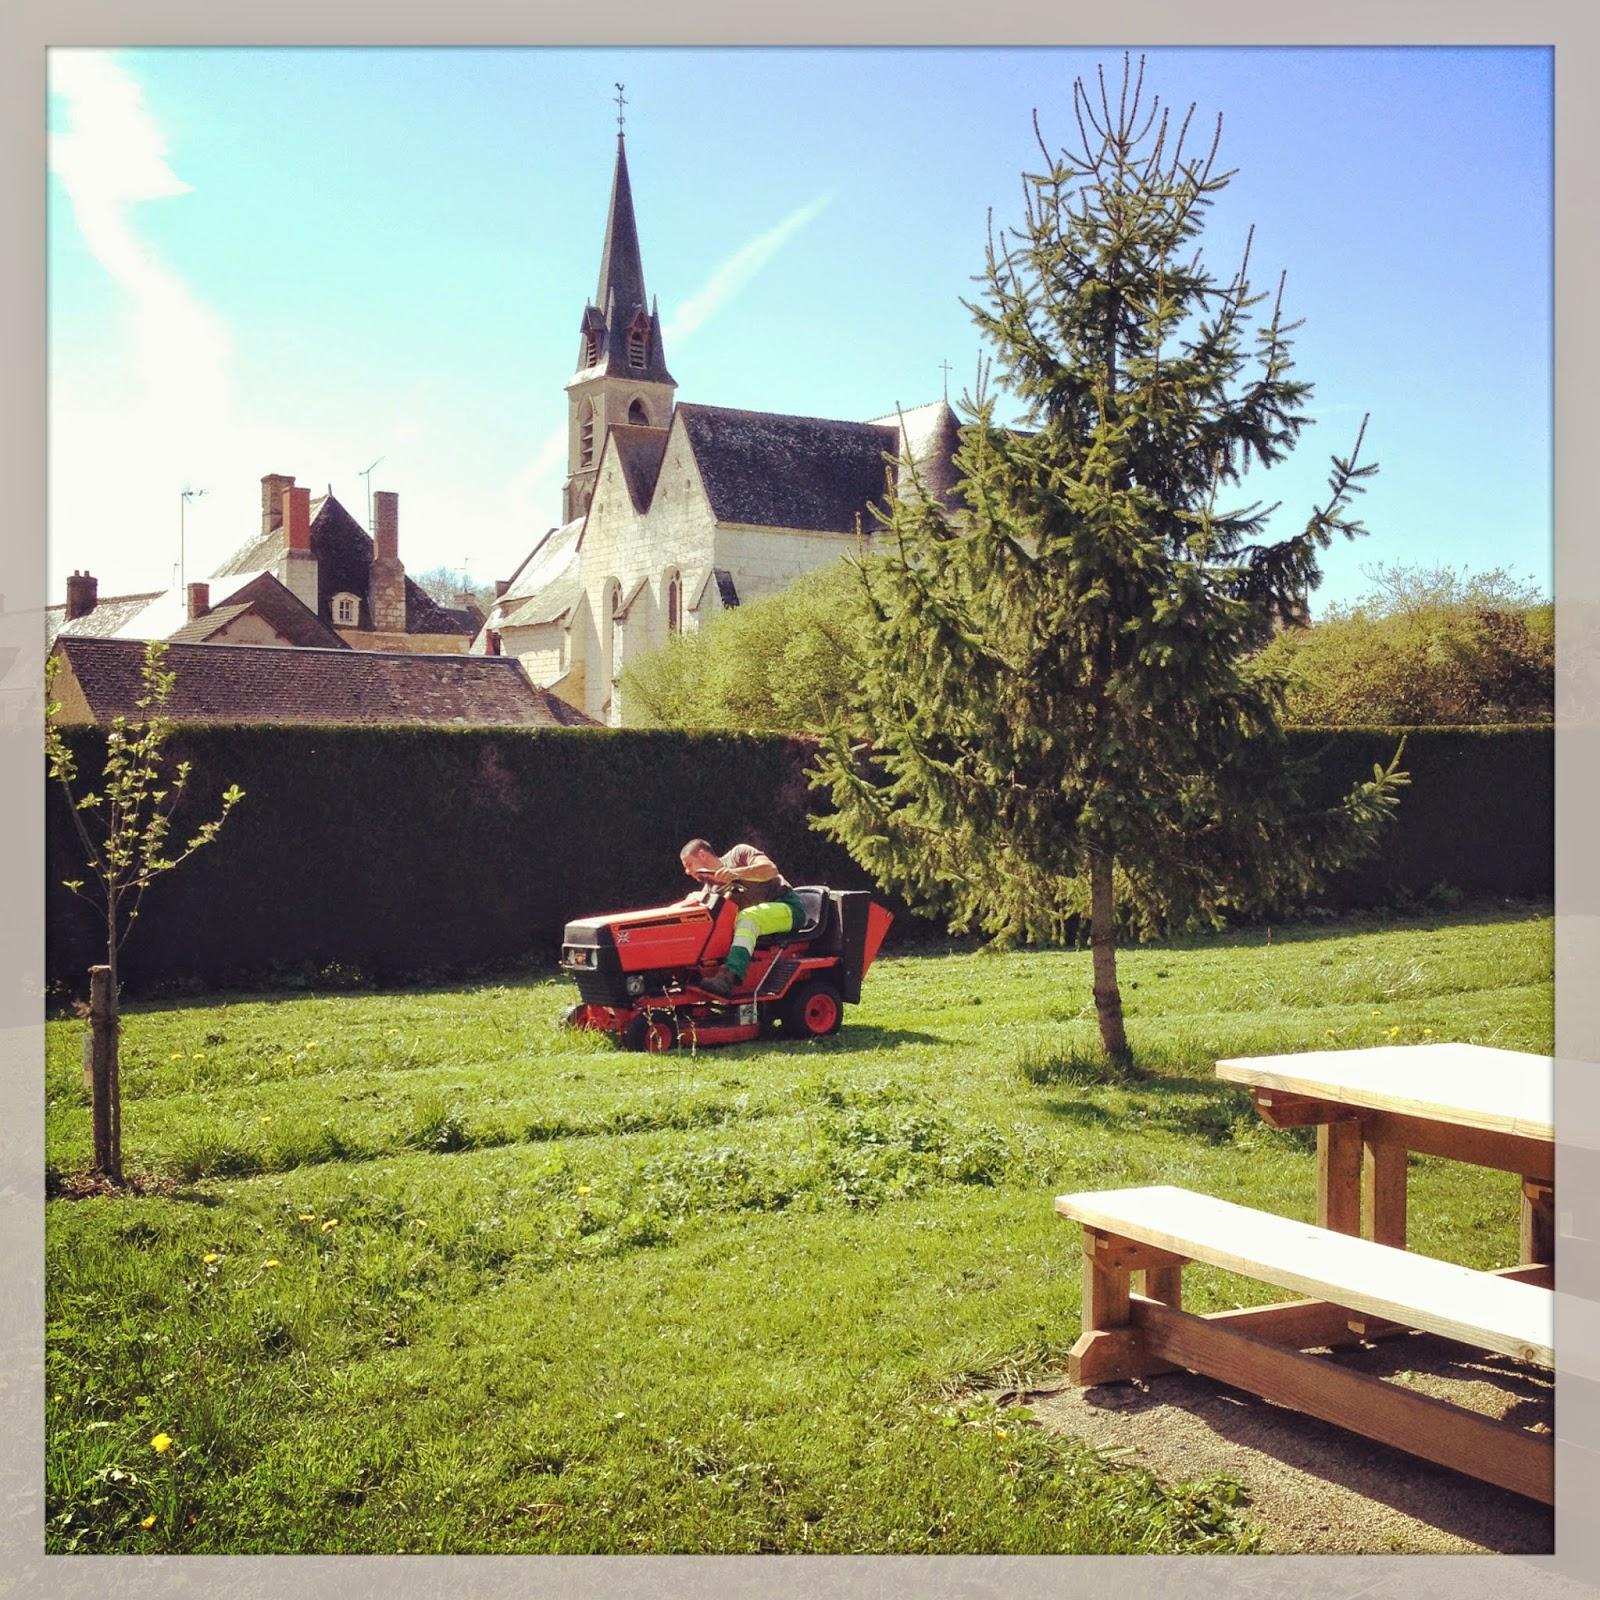 Chenu entretien du cimeti re et jardins for Entretien jardin narbonne